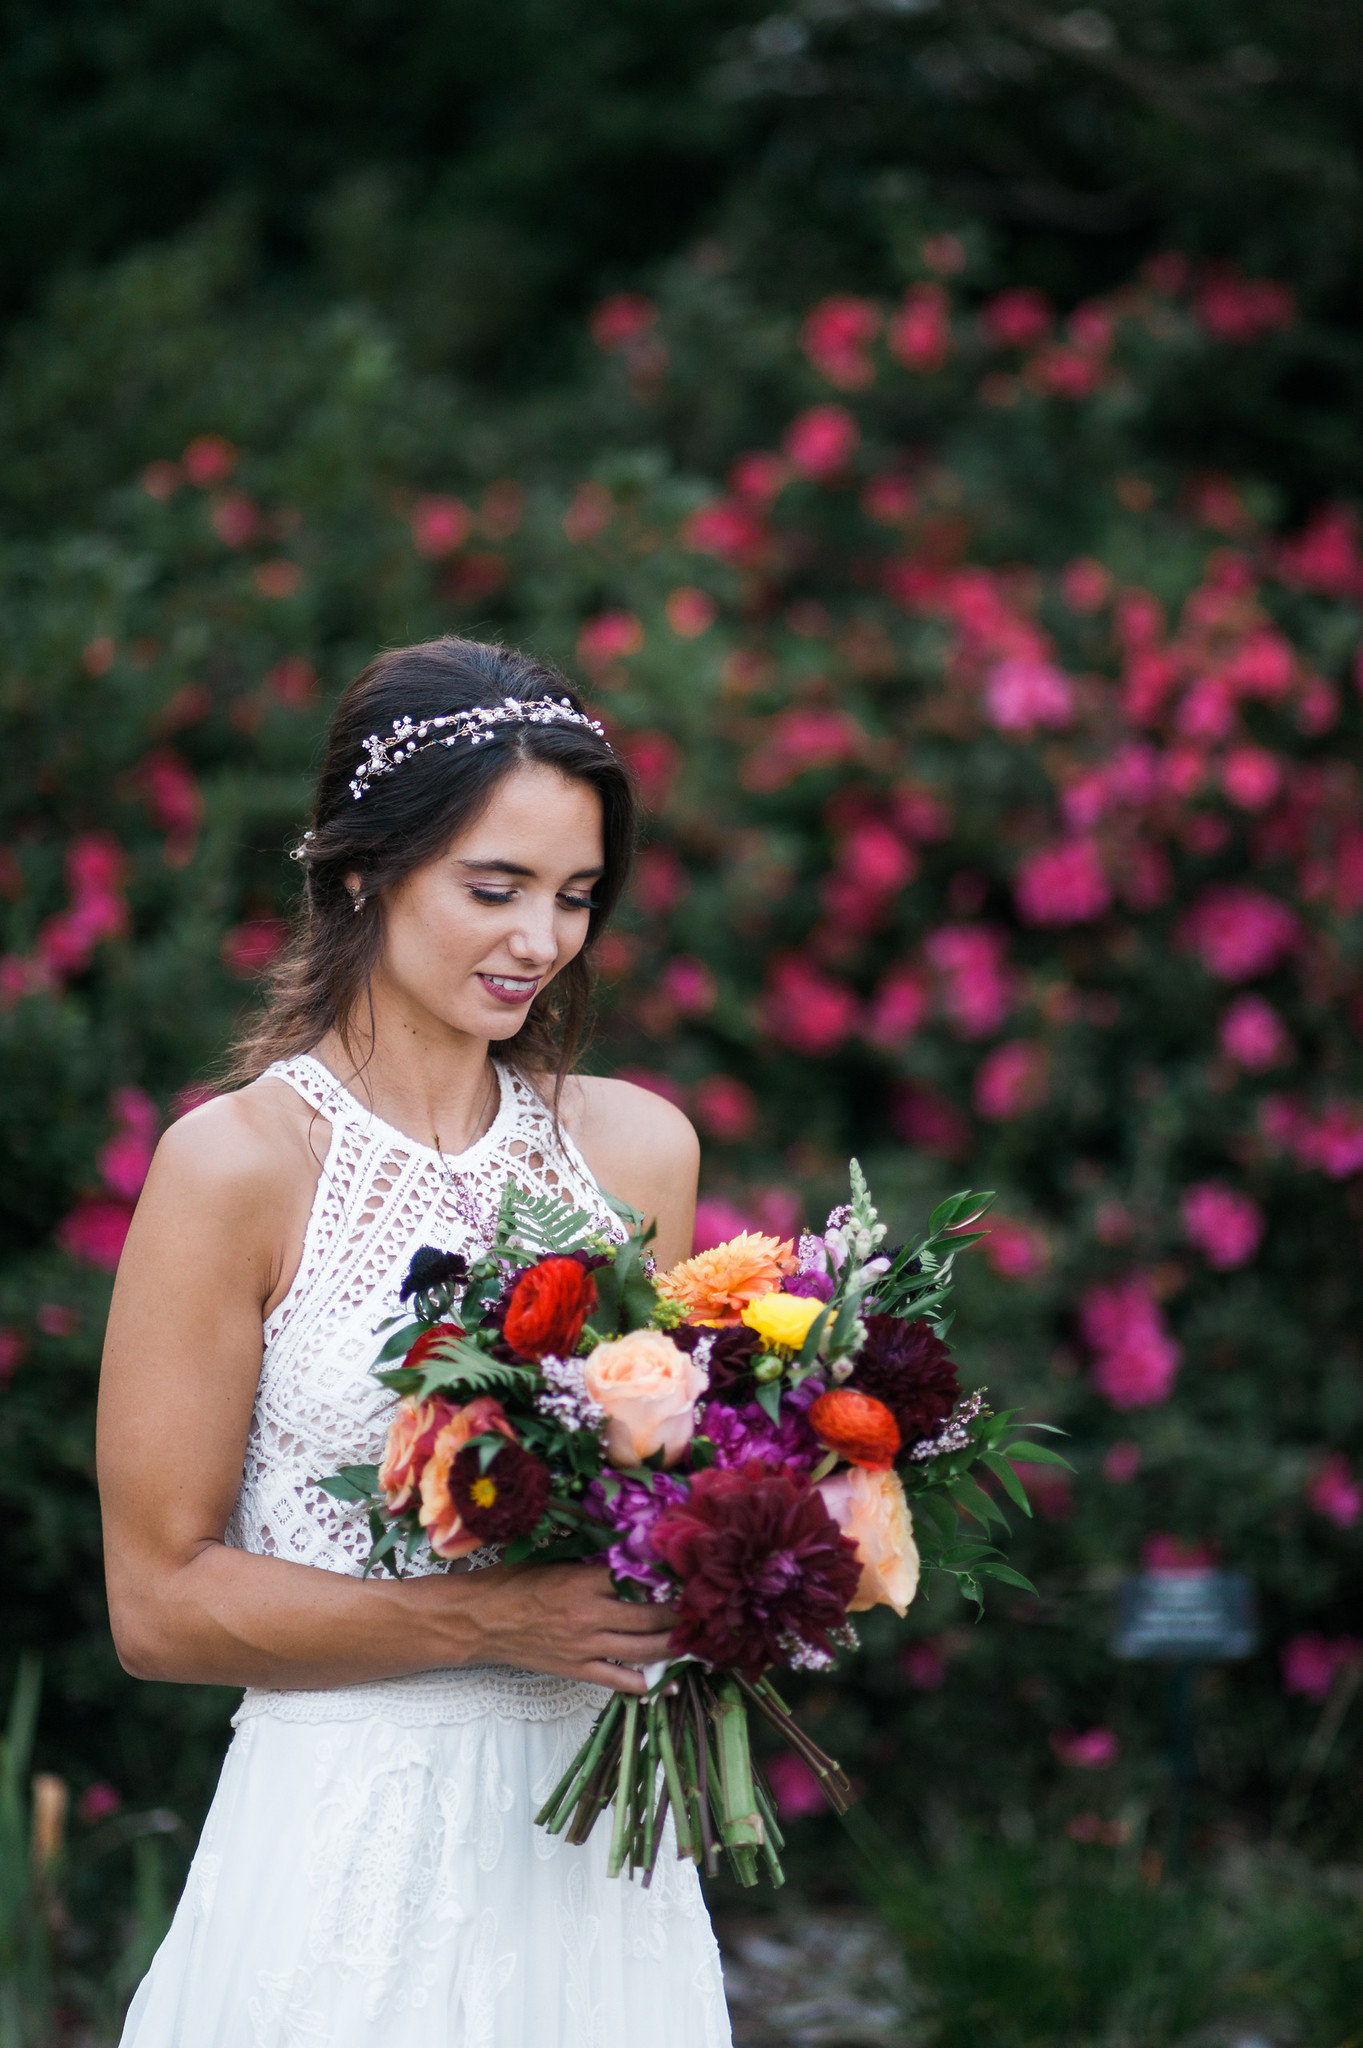 thomas-wedding-361-X4.jpg